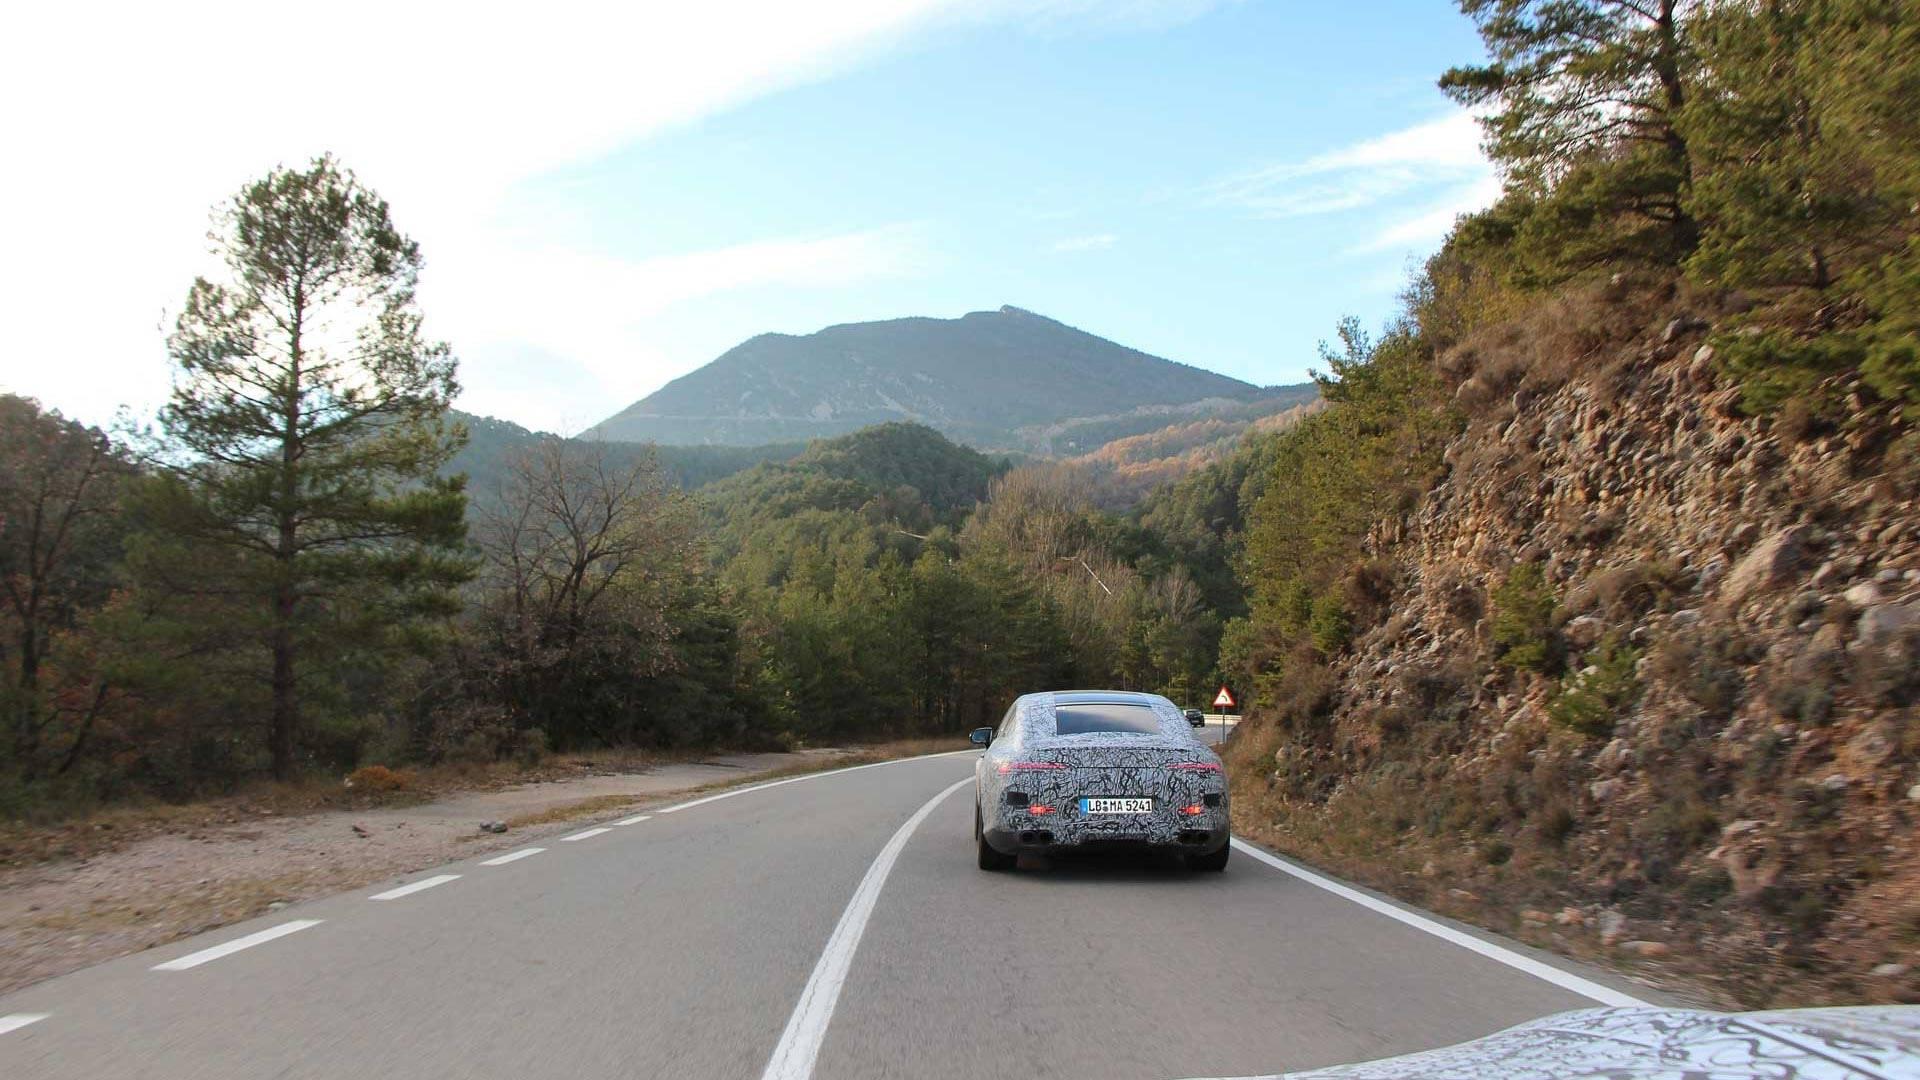 Oficial: Mercedes AMG GT Coupé, ¡ya casi está aquí!